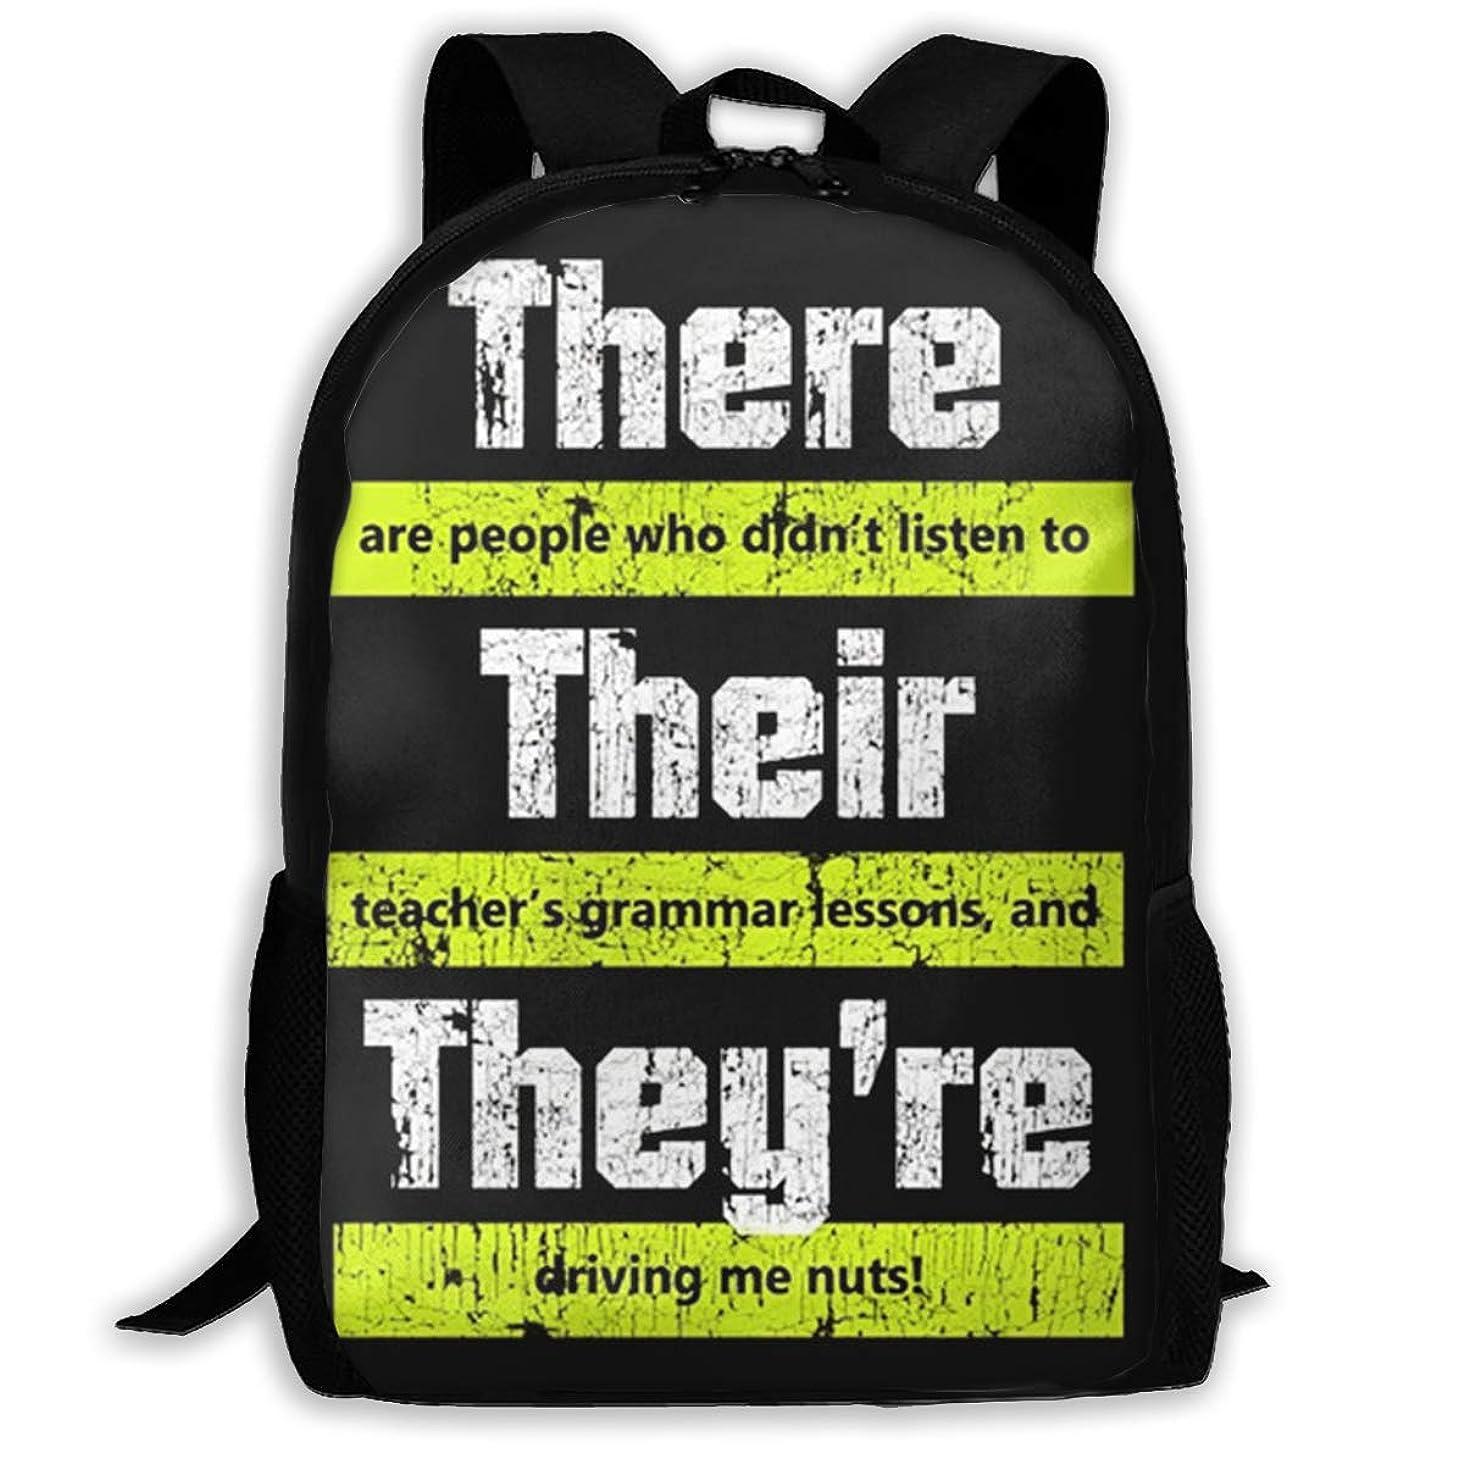 Diviviya Funny English Teacher Grammar Laptop Outdoor Backpack,Travel Hiking&Camping Rucksack Pack,Casual Large College School Daypack,Shoulder Book Bags Back